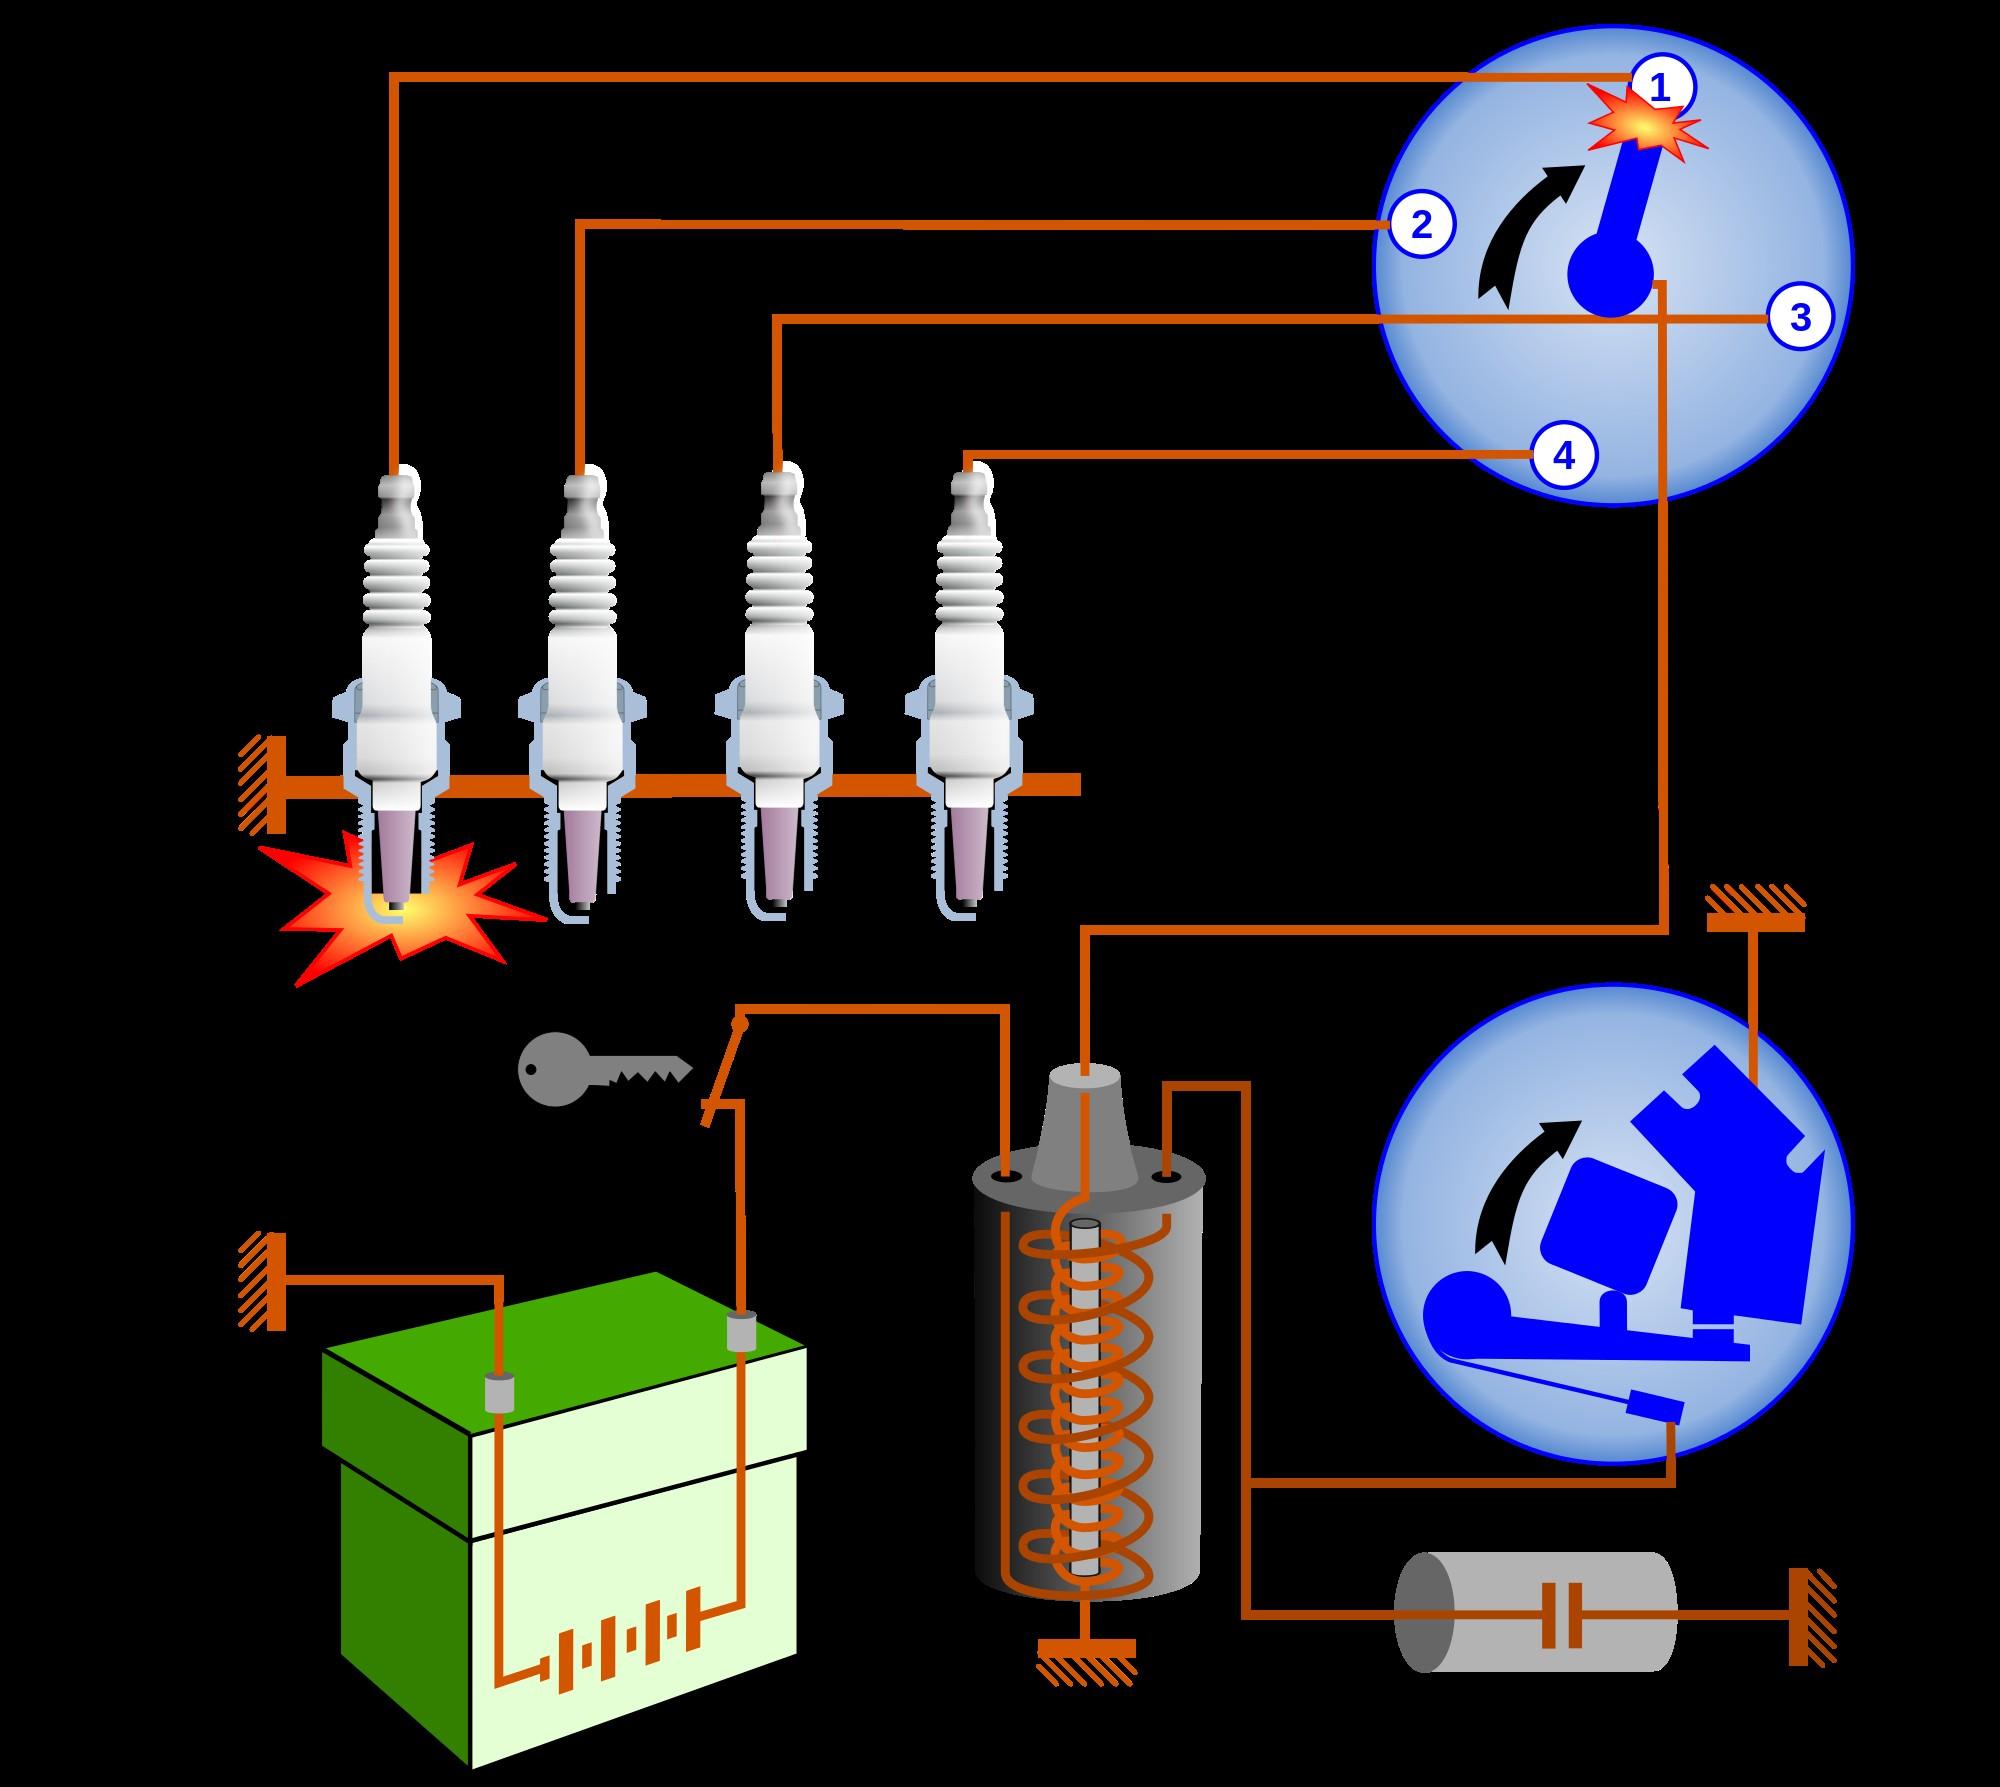 Car Ignition System Diagram Car Ignition System Diagram Wiring Diagram Of Car Ignition System Diagram